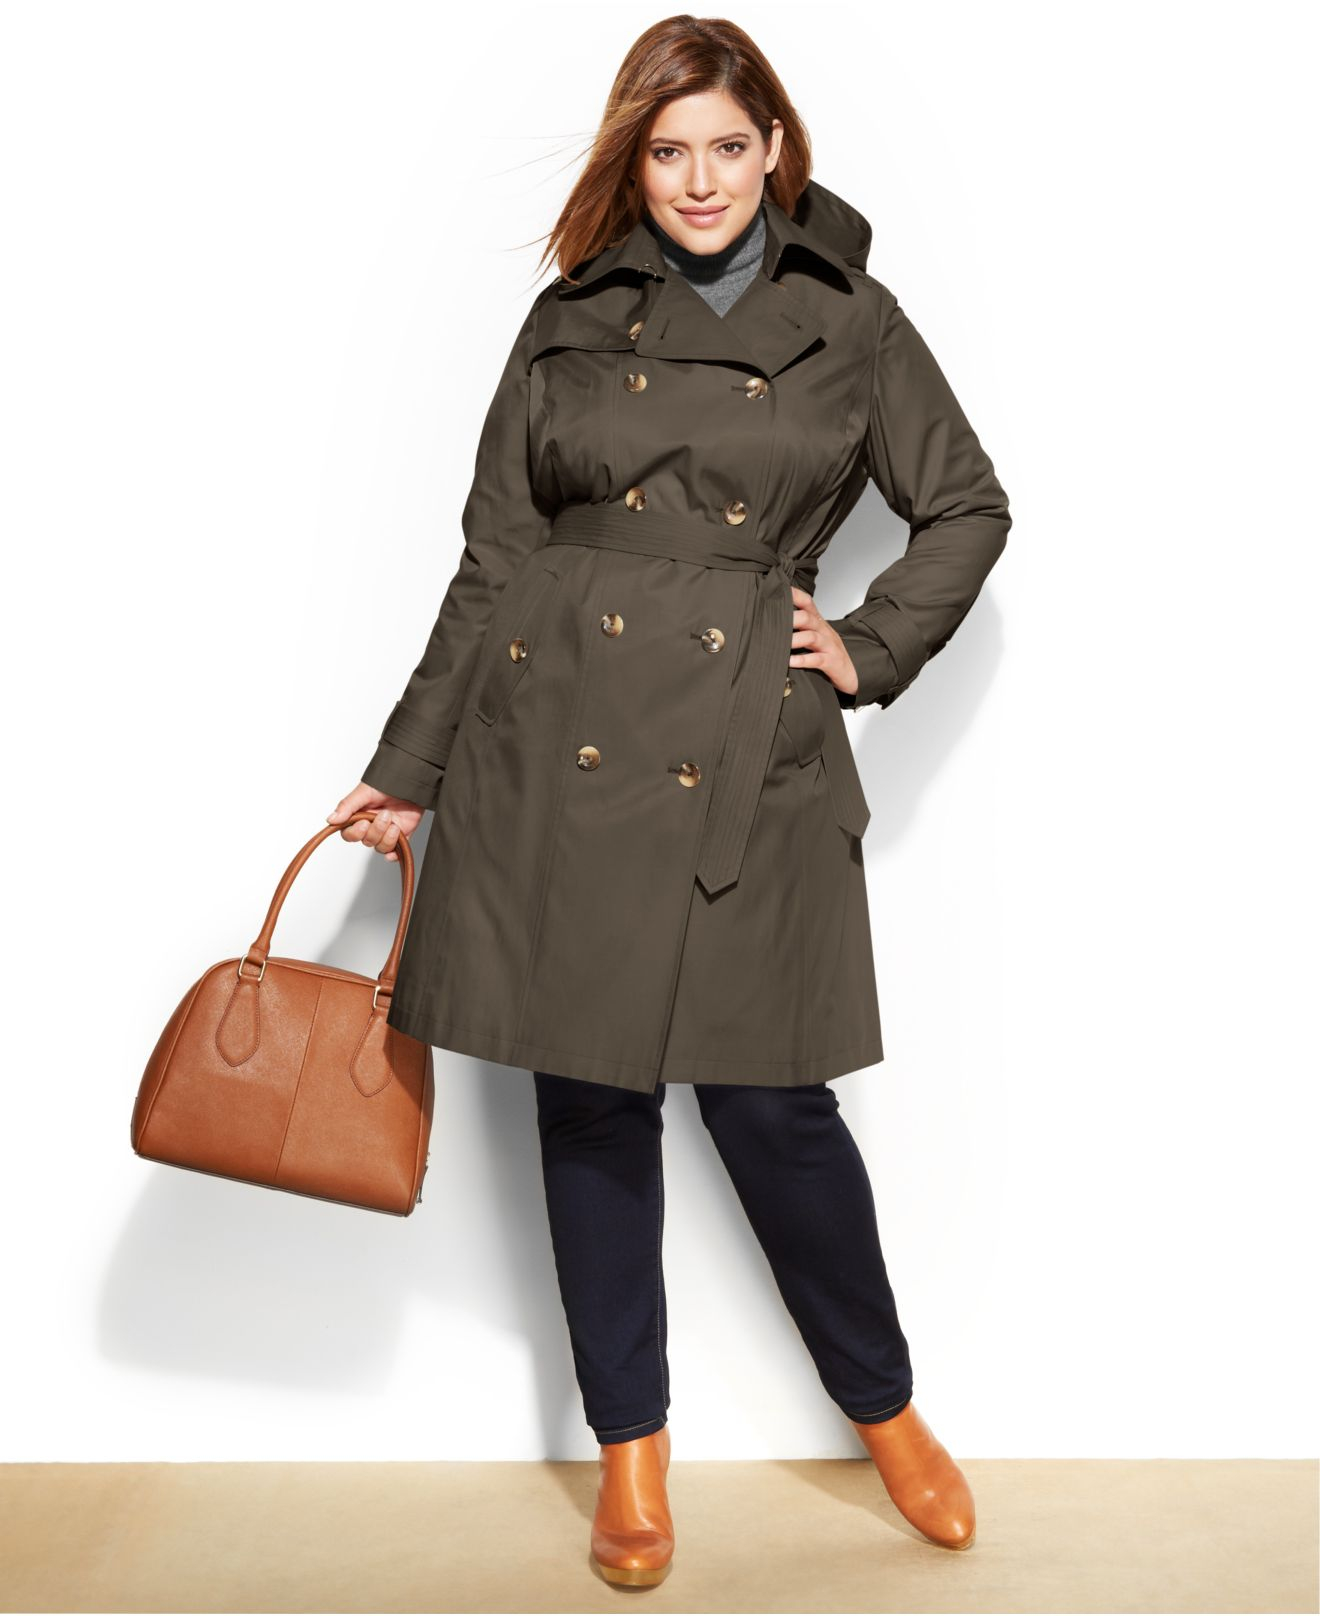 plus size trench coat long black wool trench coat womens tradingbasis zyqtkzr